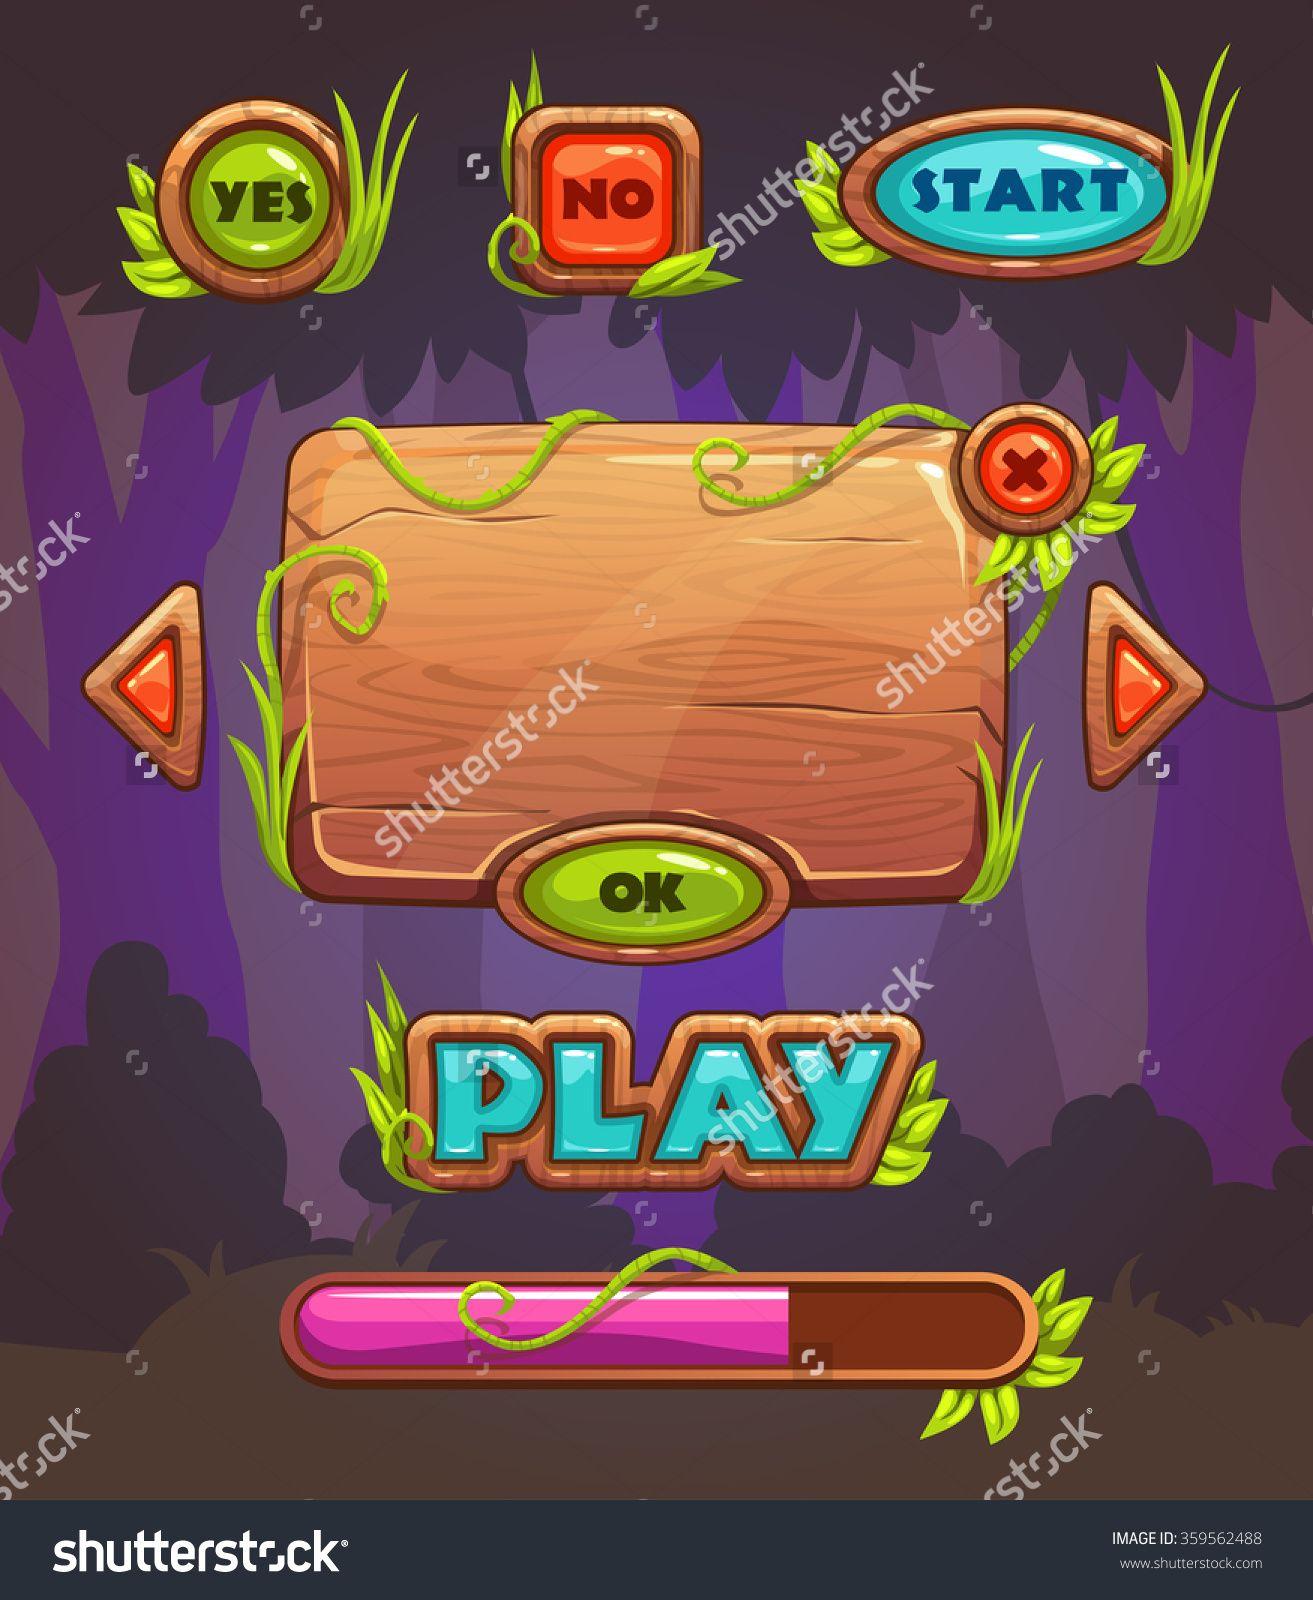 Pin on Mobile Game UI